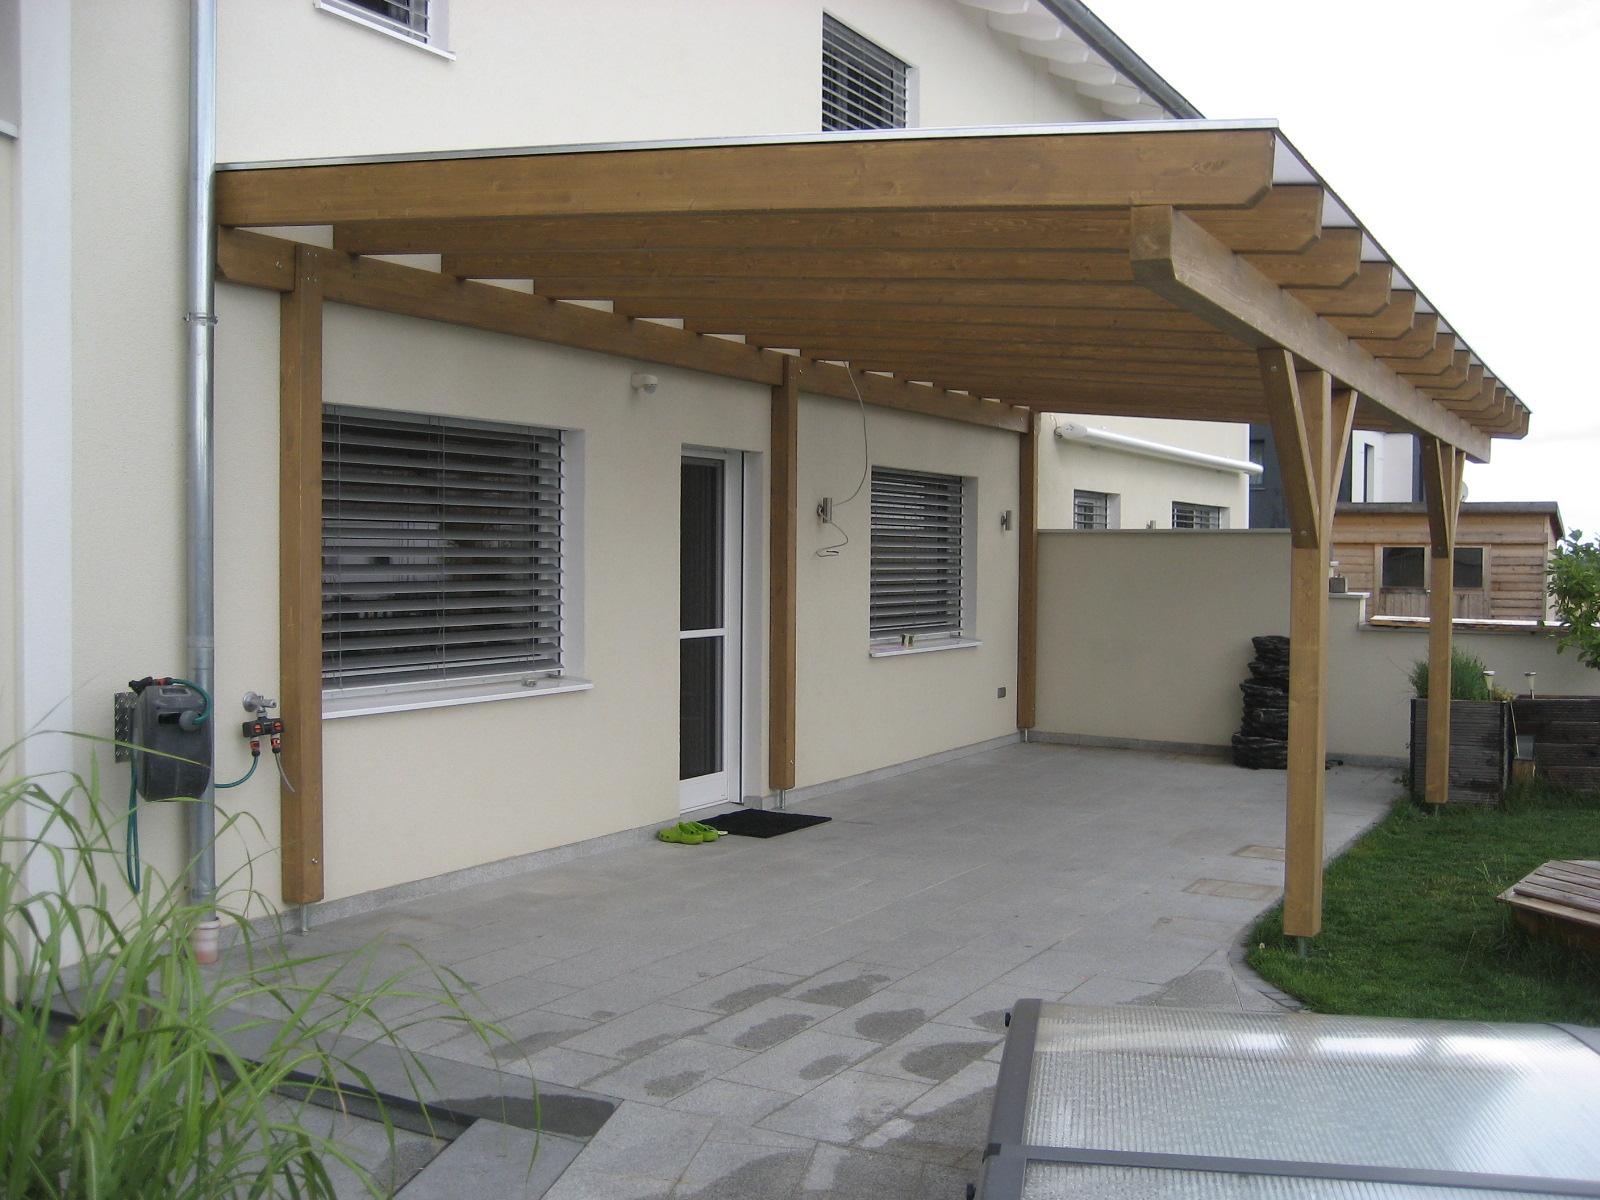 Terrassenüberdachung mit Thermoclear-Stegplatten